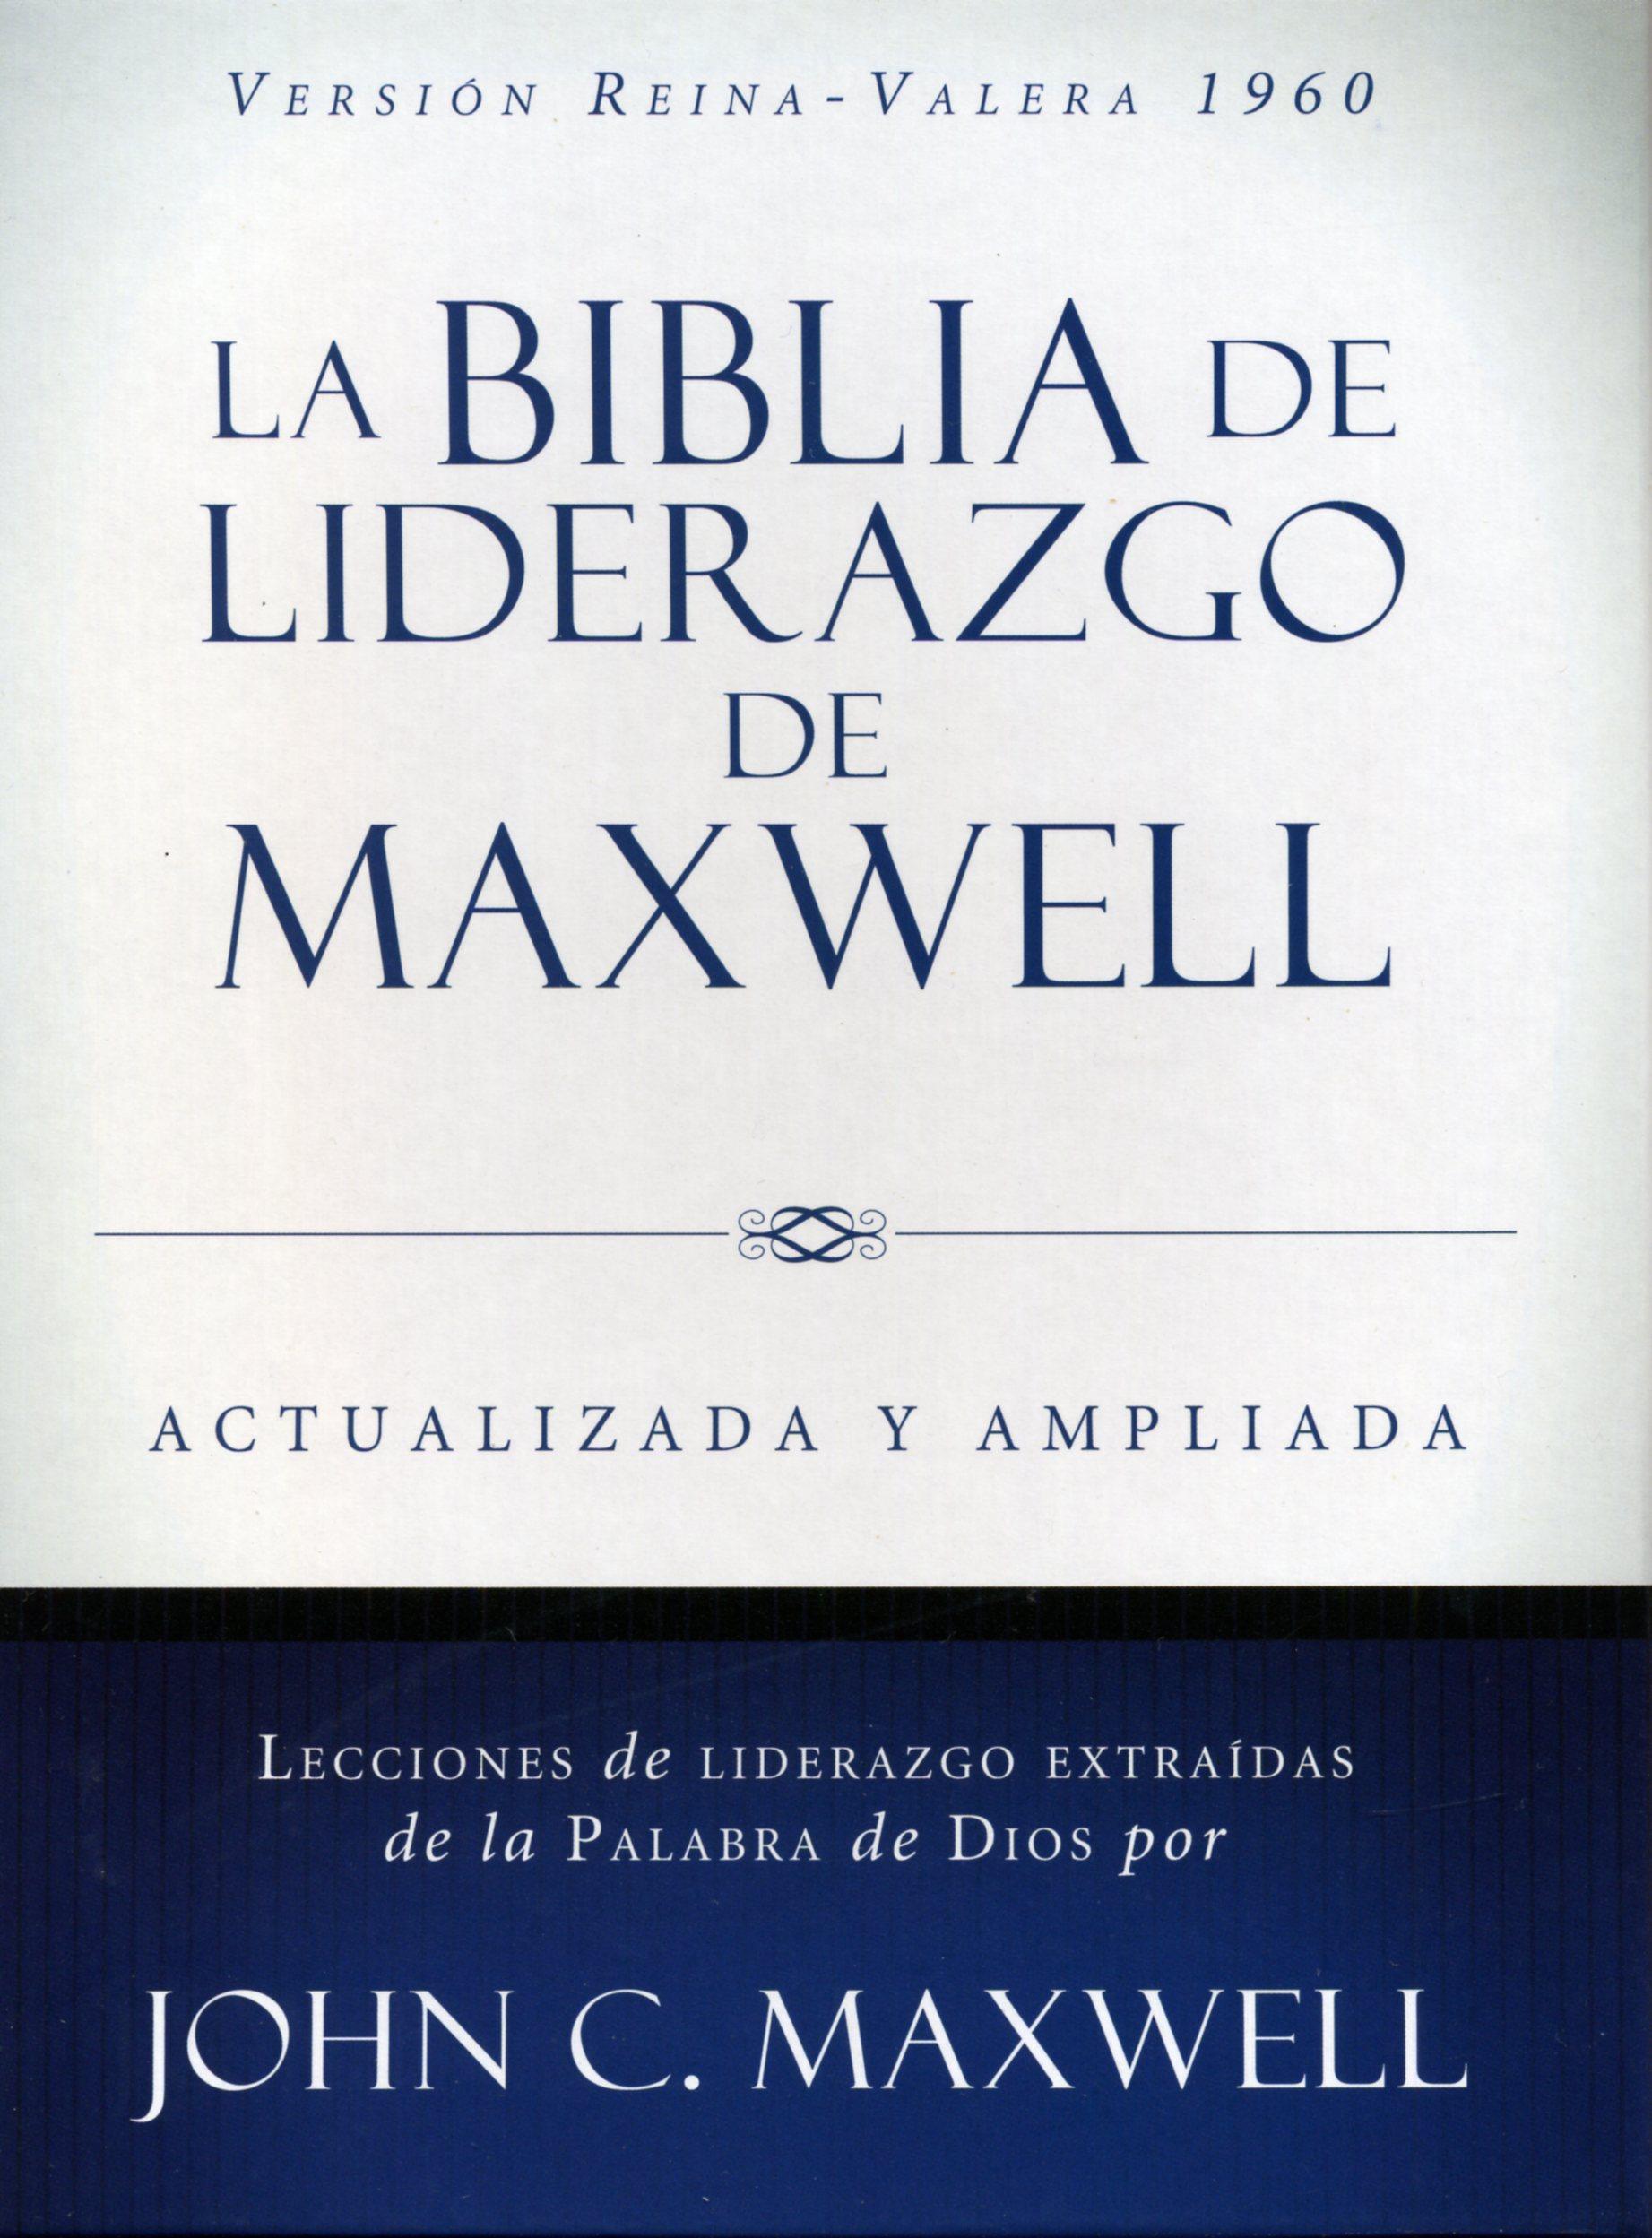 Biblia De Liderazgo De Maxwell Tamaño Manual Reina Valera 1960 9780718092559 Clc Colombia